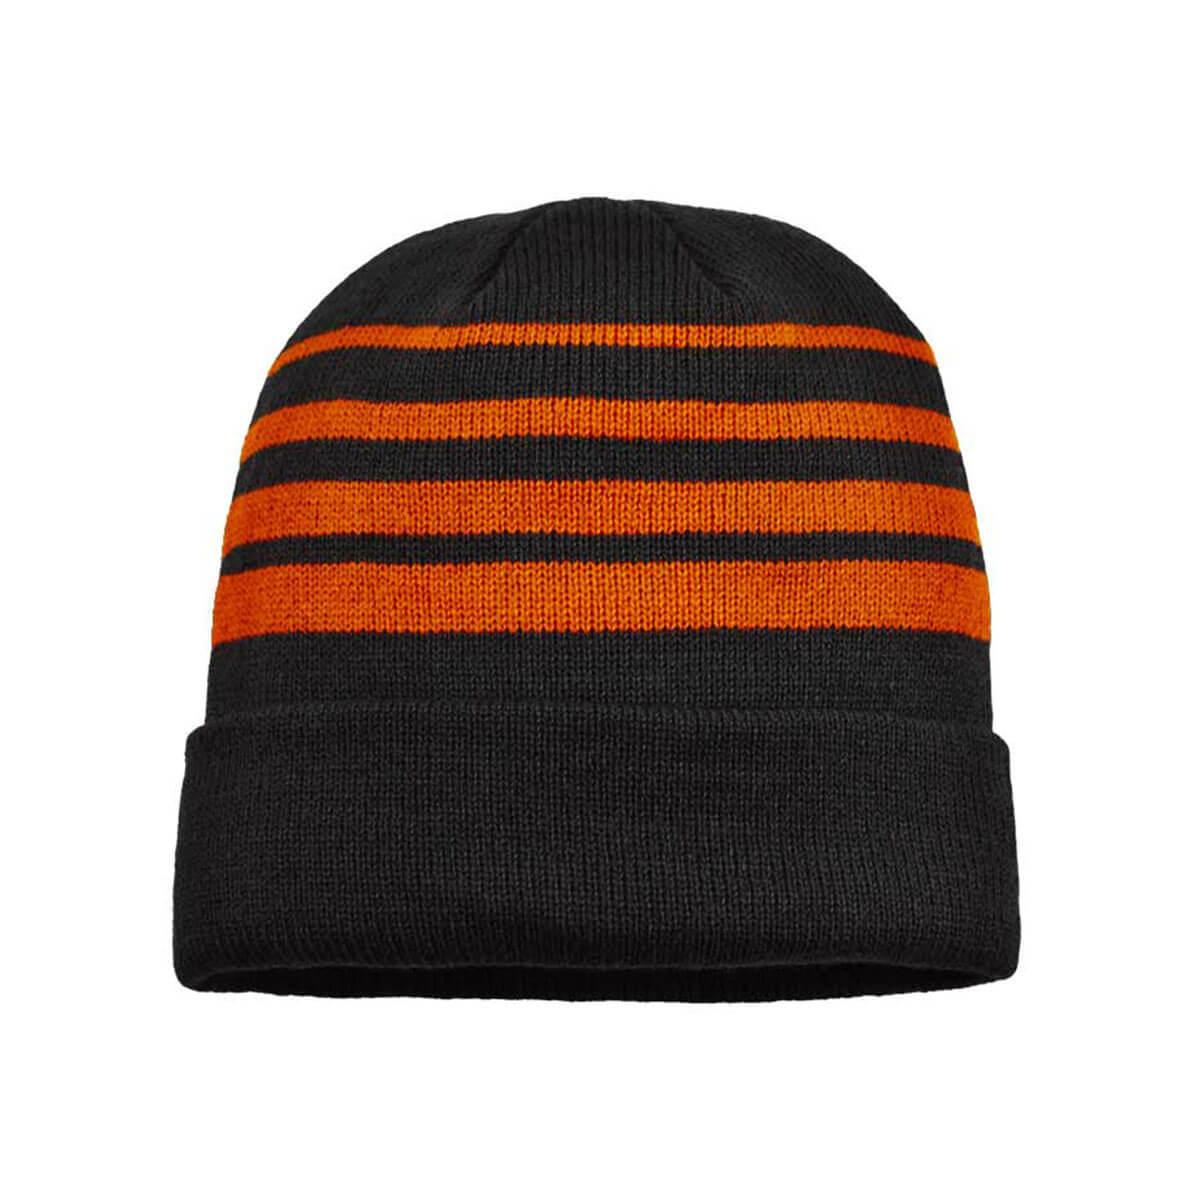 Acrylic Beanie-Black / Orange